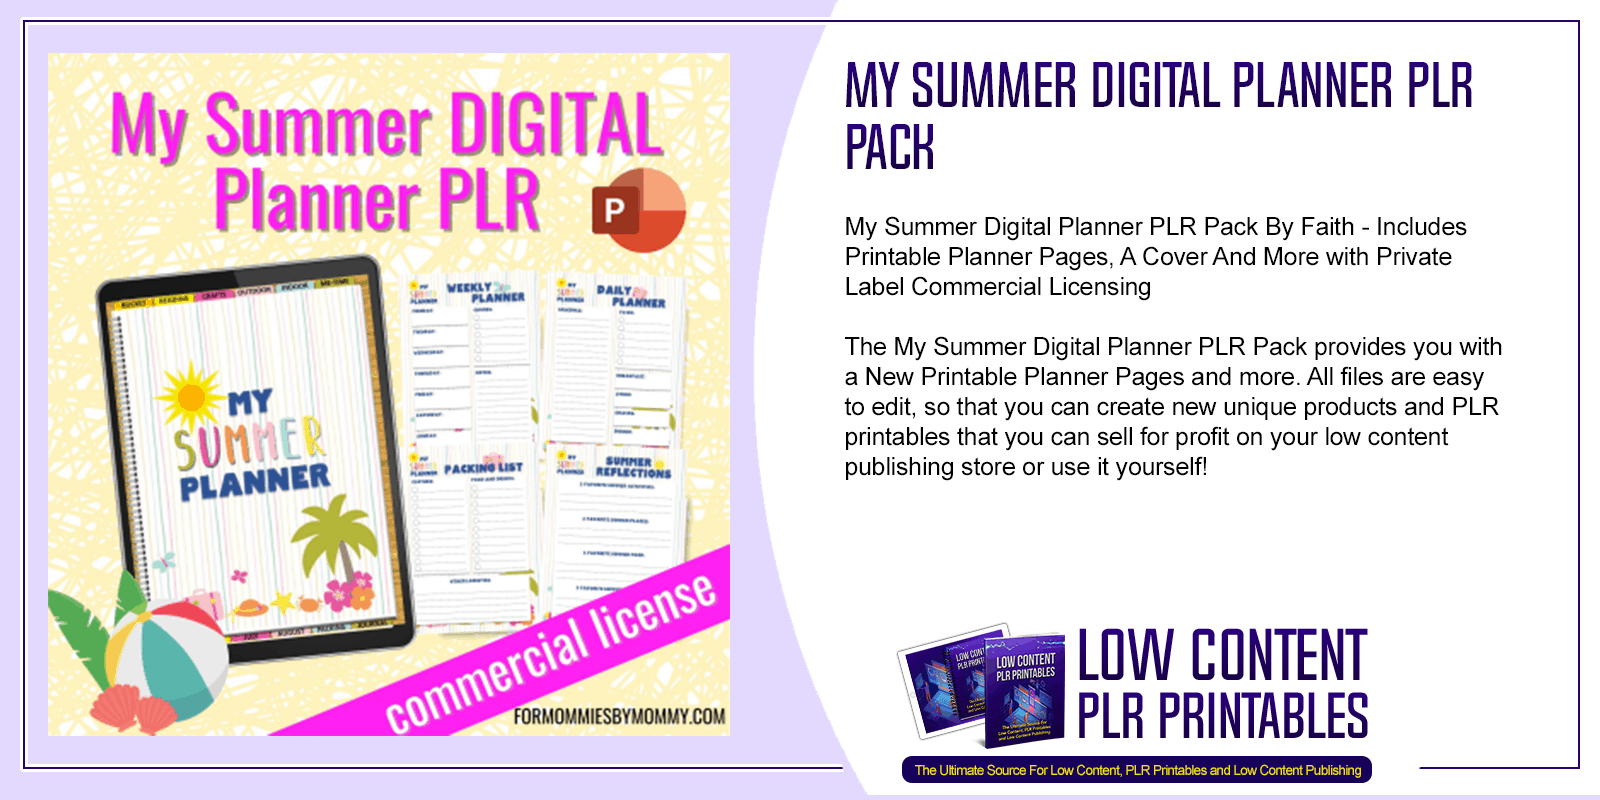 My Summer Digital Planner PLR Pack